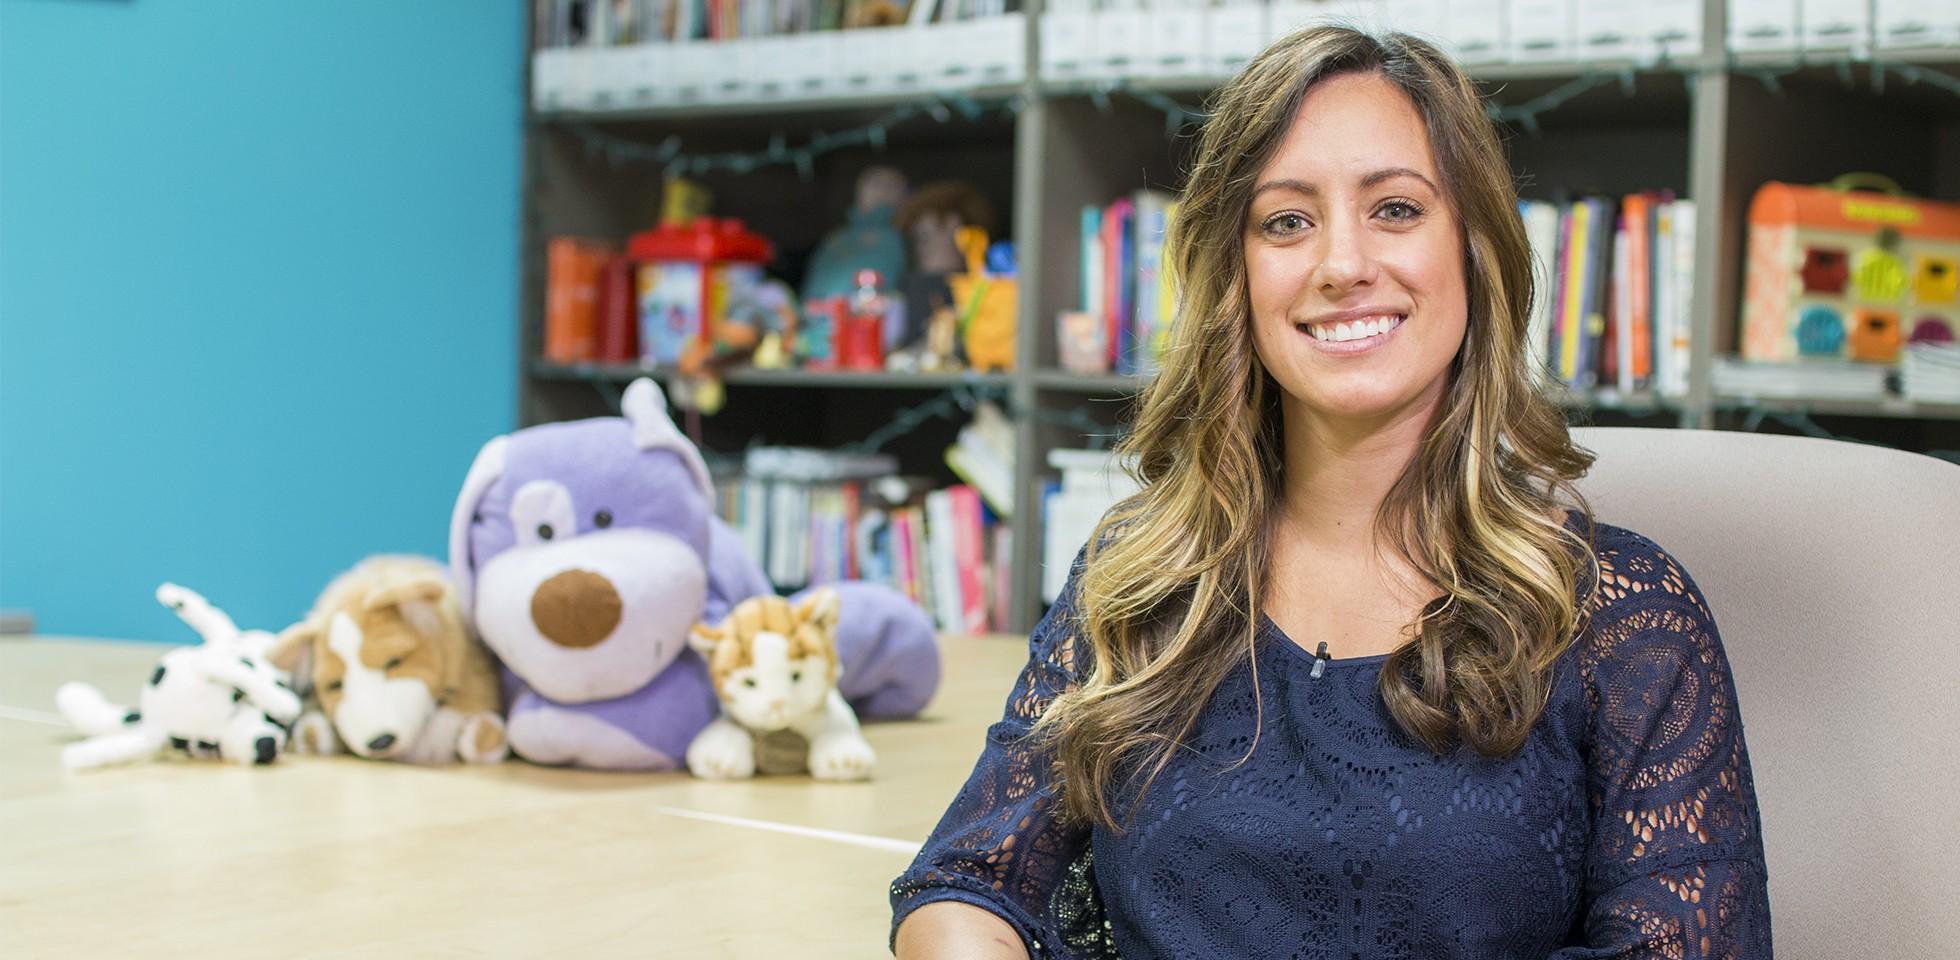 Kristy Wilkinson, Senior Art Director - Circa Healthcare Careers